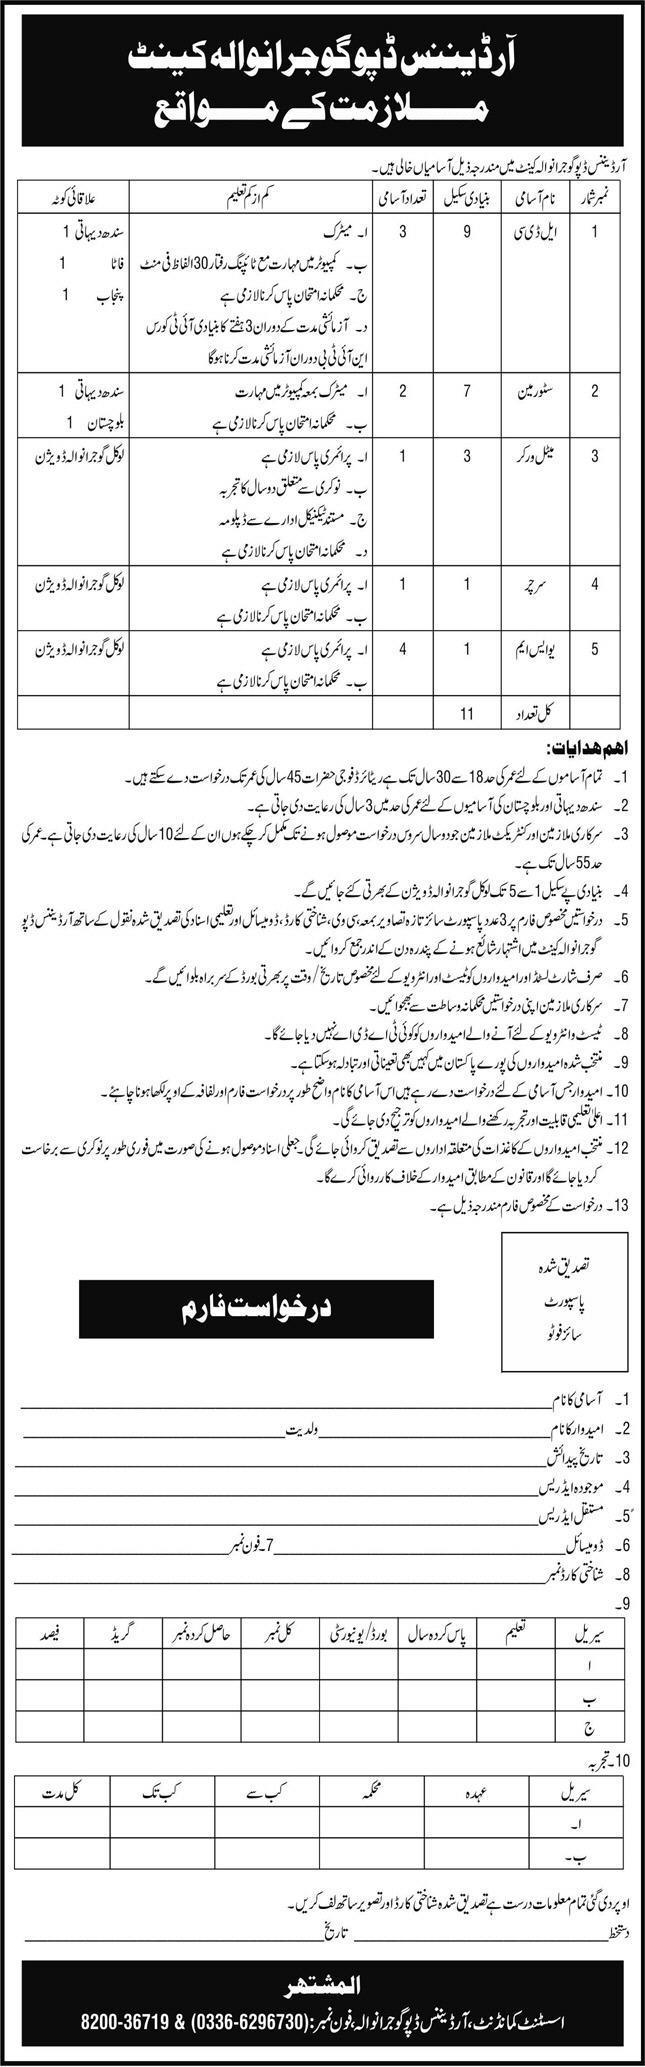 Pakistan Army Ordnance Depot Gujranwala Cantt Jobs 2021 for LDC, USM